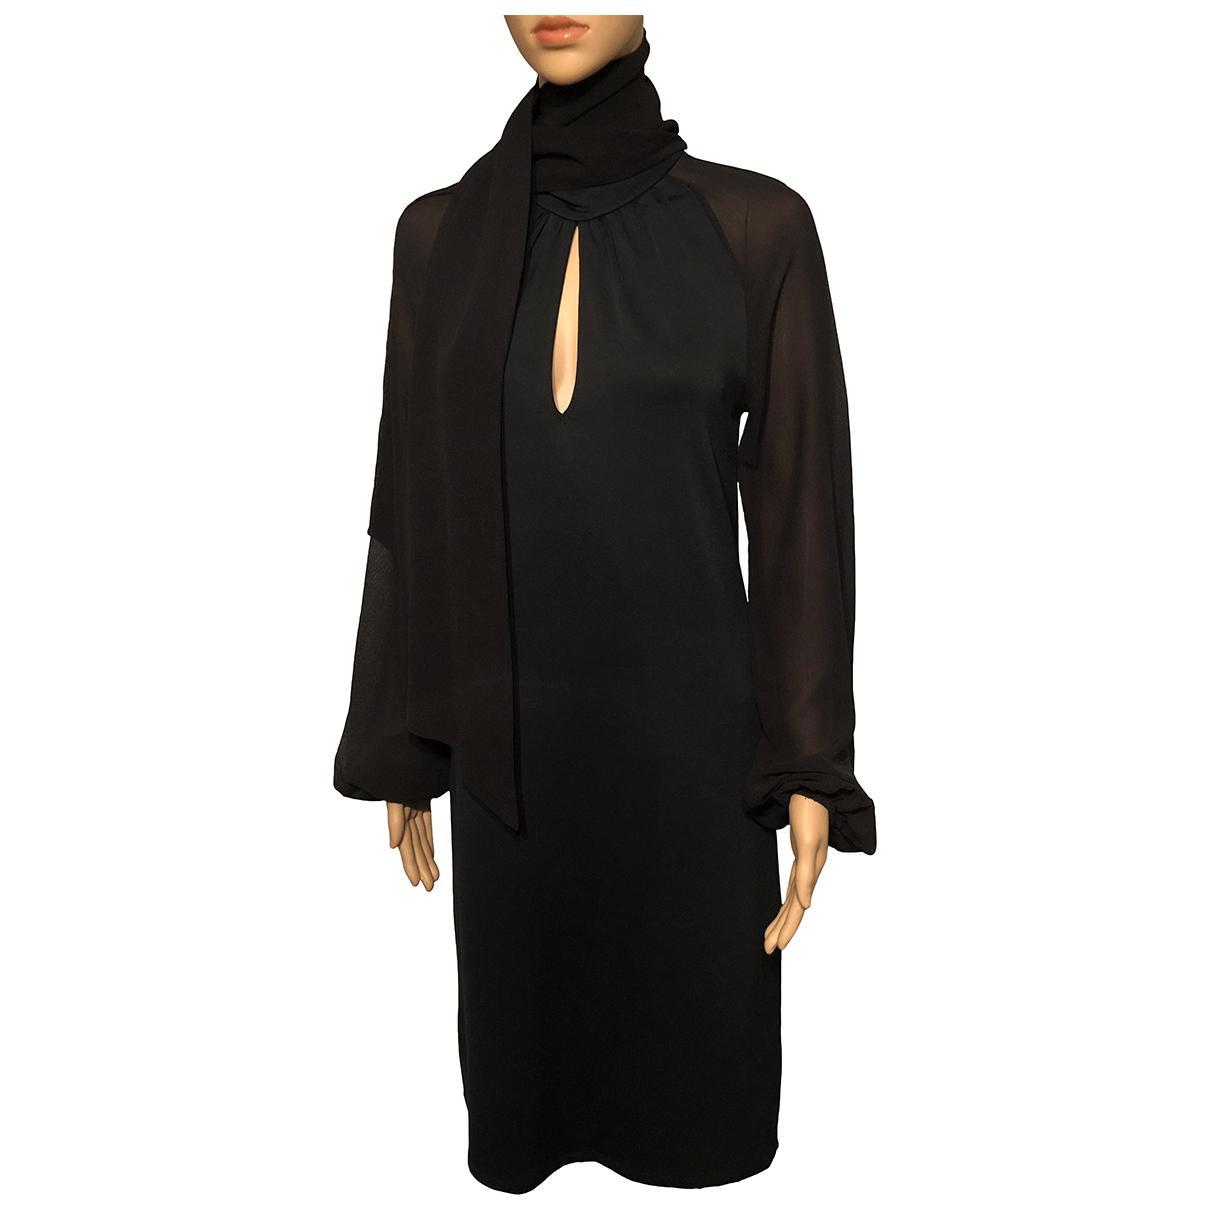 Max Mara Studio N Black dress for Women 42 IT